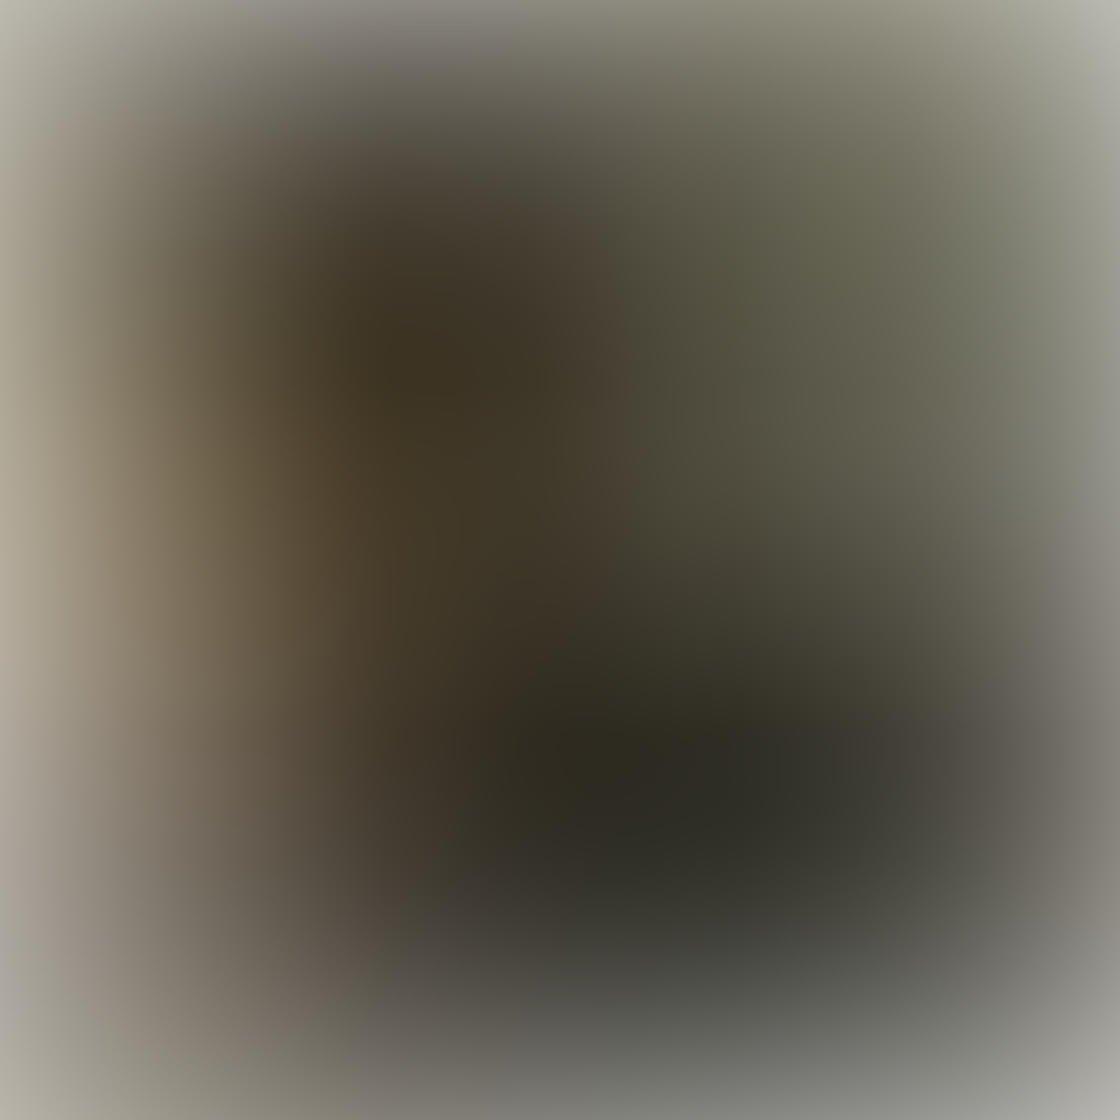 Kimberly Saxton-Heinrichs iPhone Photos 34